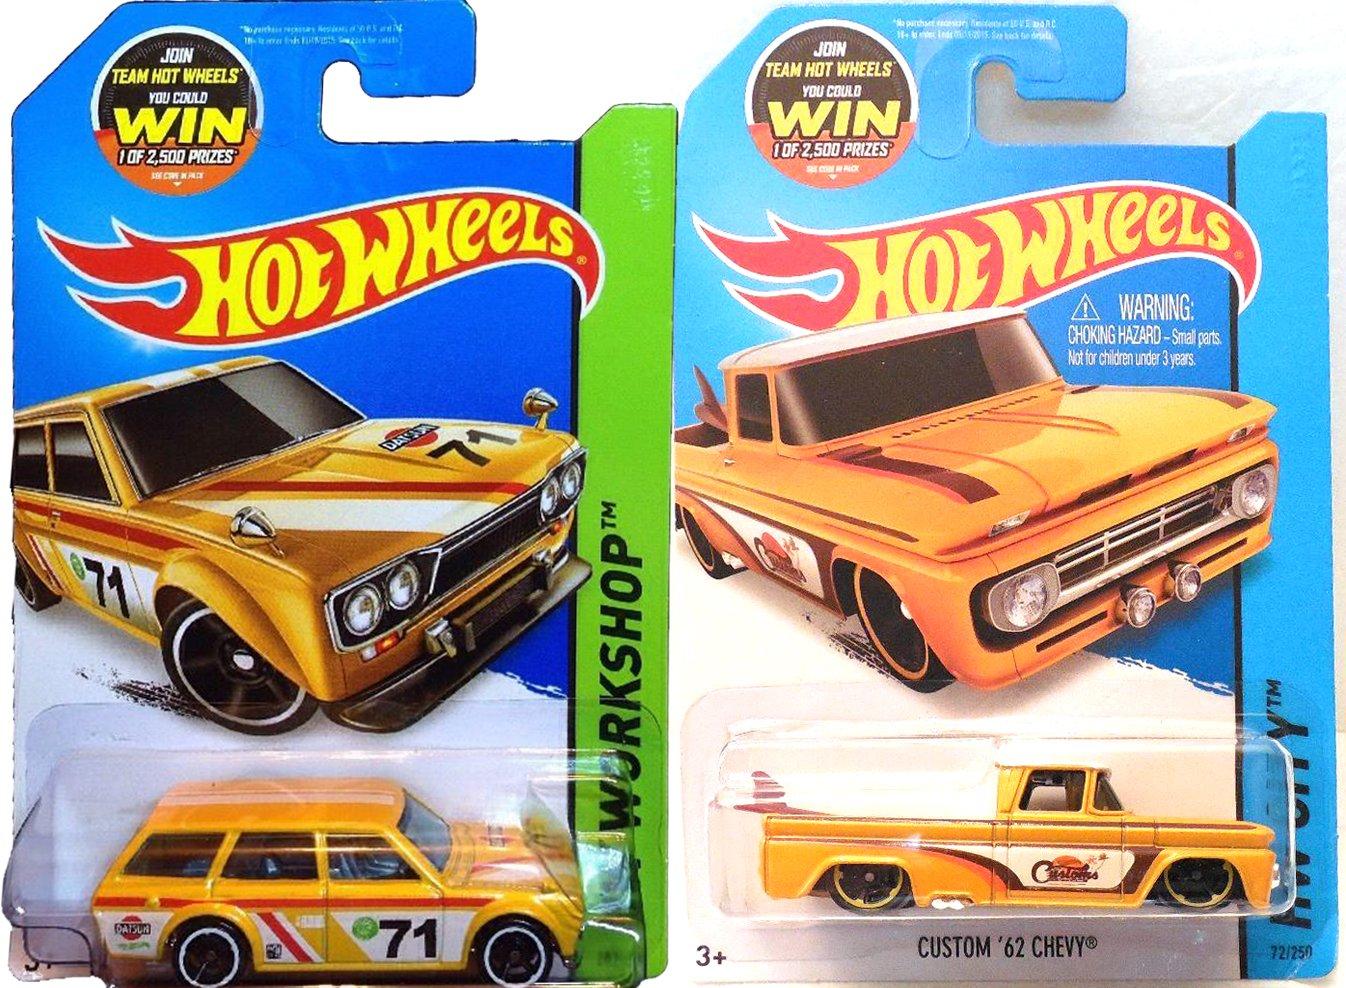 Summer Yellow Hot Wheels Truck & Wagon Set - Datsun Bluebird 510 & Custom '62 Chevy Hot Wheels HW City Garage Surf Shop Patrol 2015 IN PROTECTIVE CASES